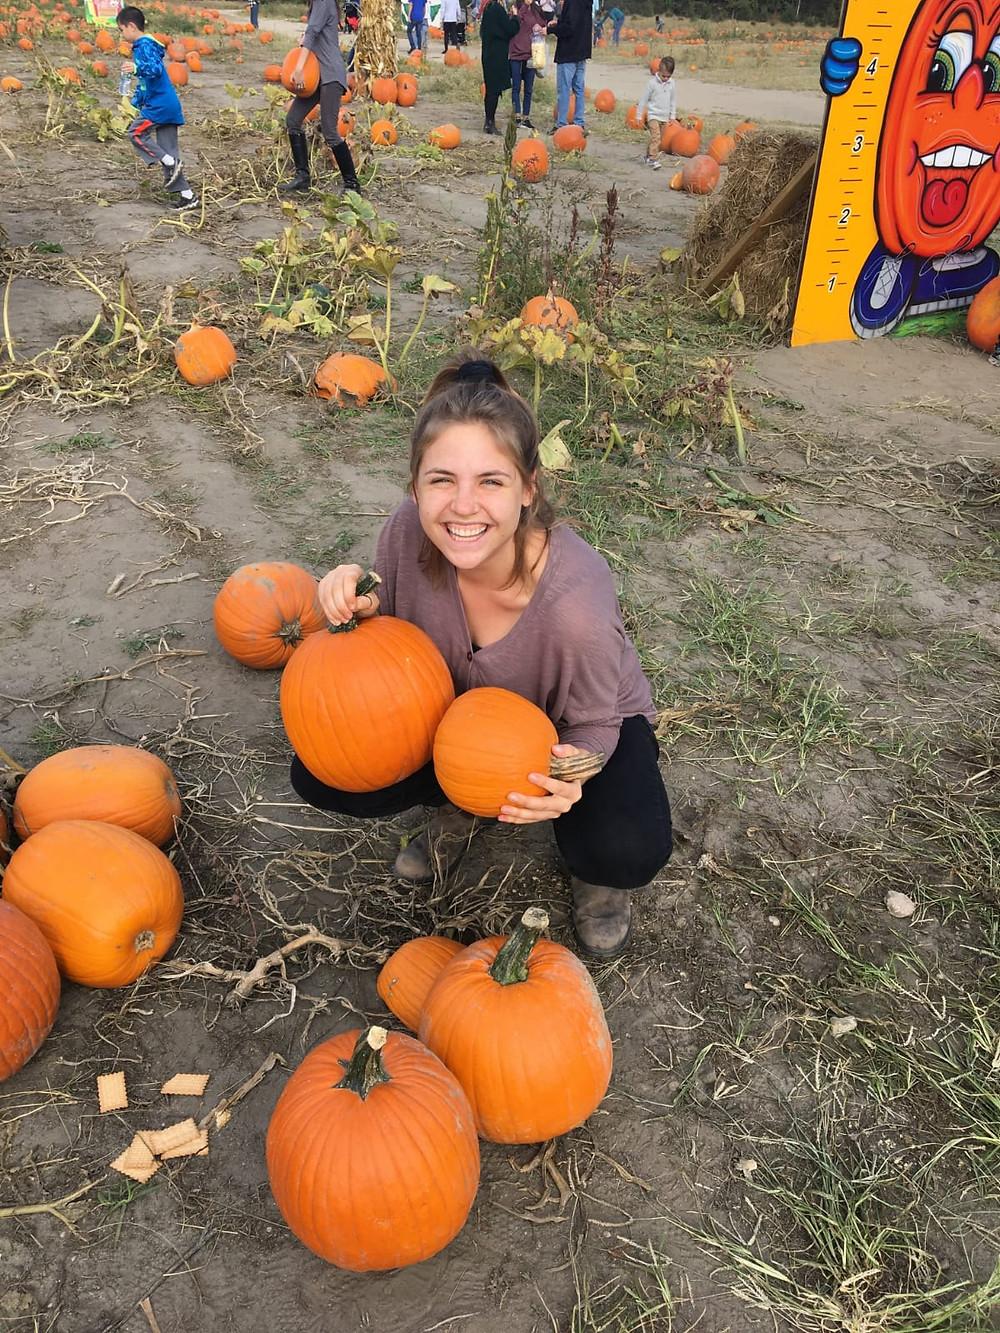 Oleh Kayla Rosen picking pumpkins in a pumpkin patch